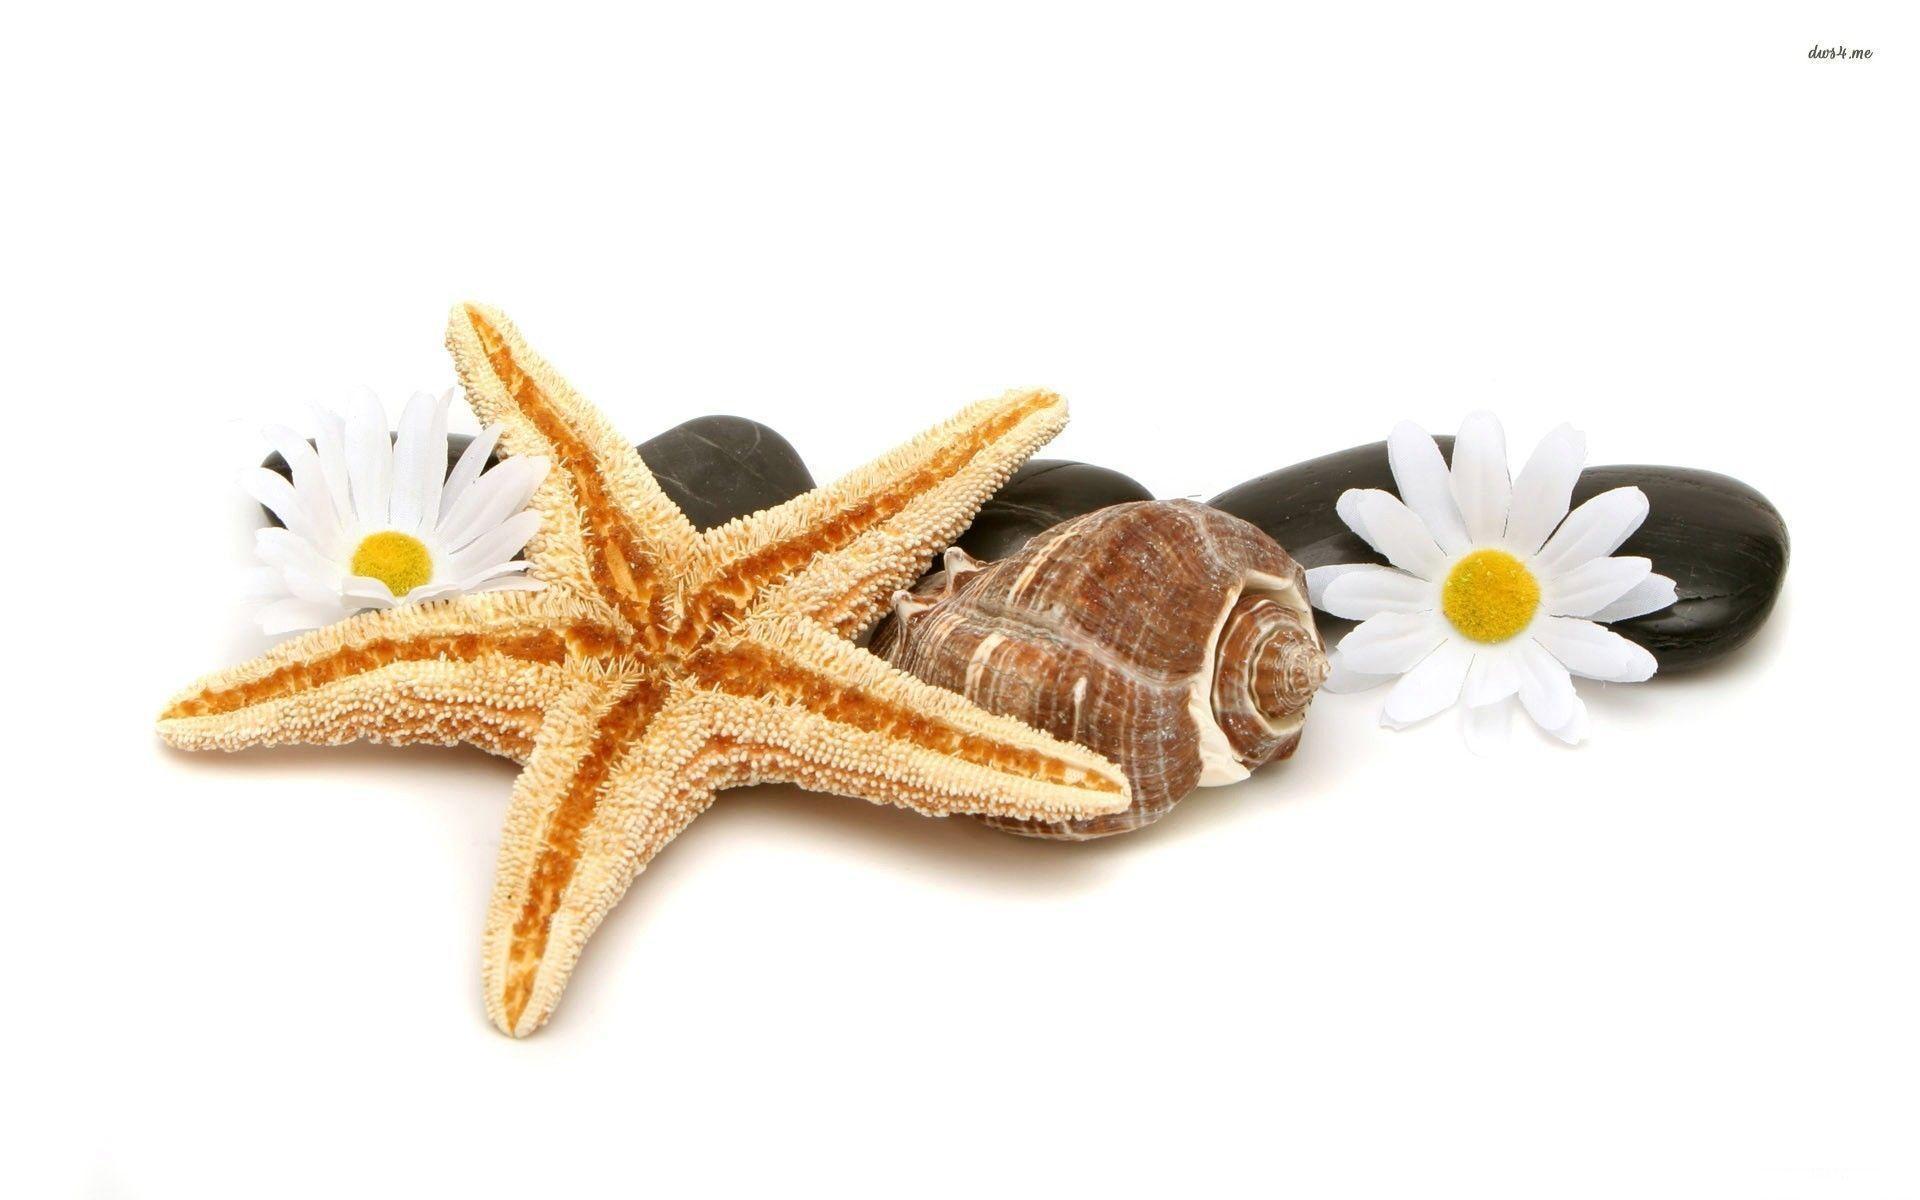 Sea Shells Wallpapers Wallpaper Cave HD Wallpapers Download Free Images Wallpaper [1000image.com]